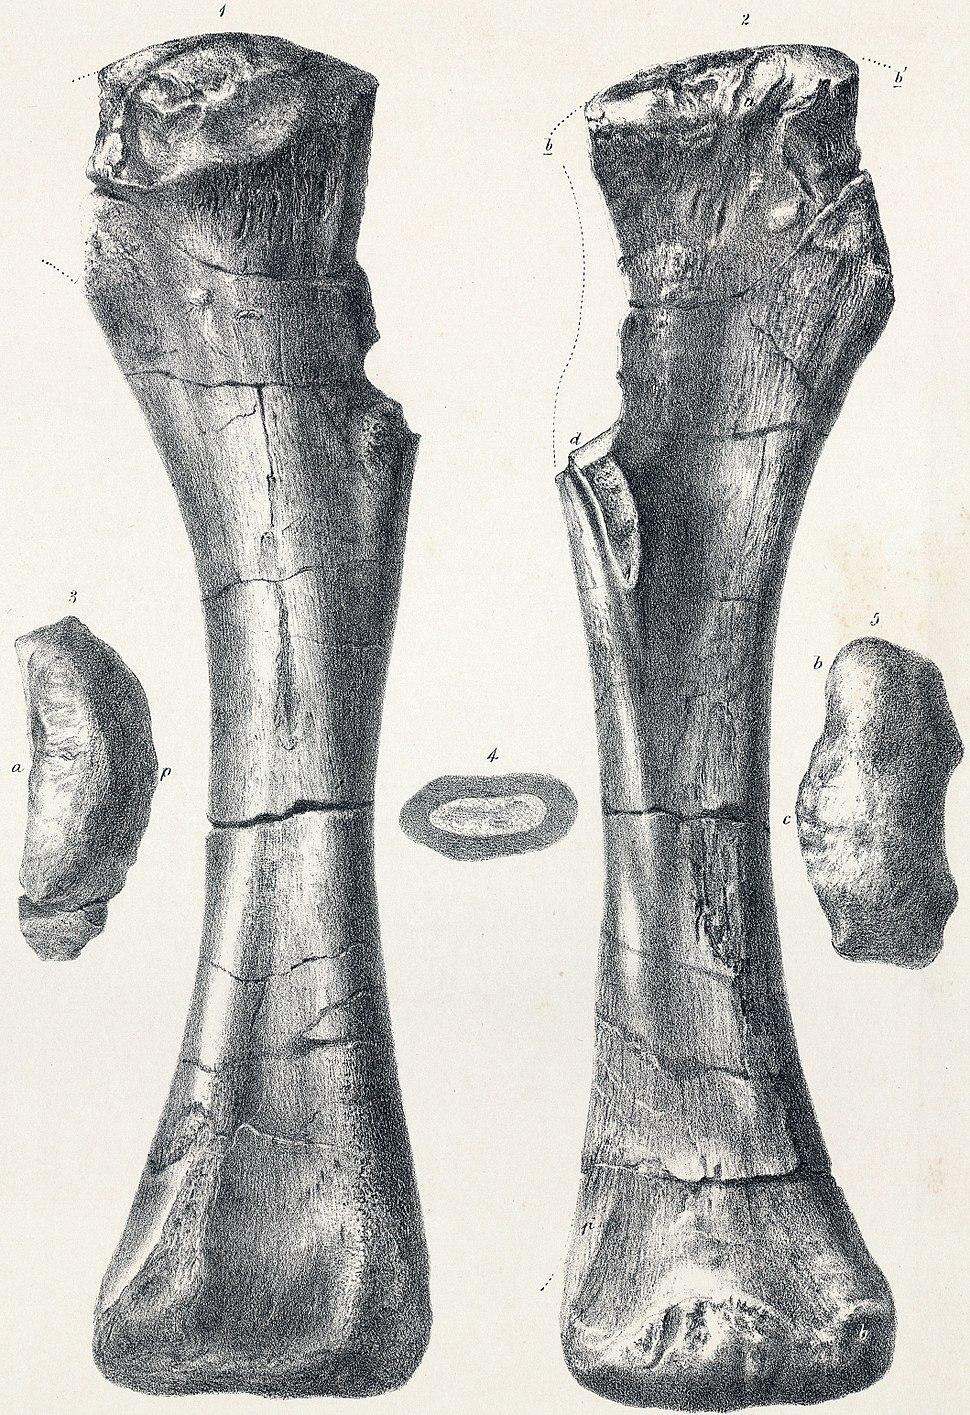 Pelorosaurus holotype